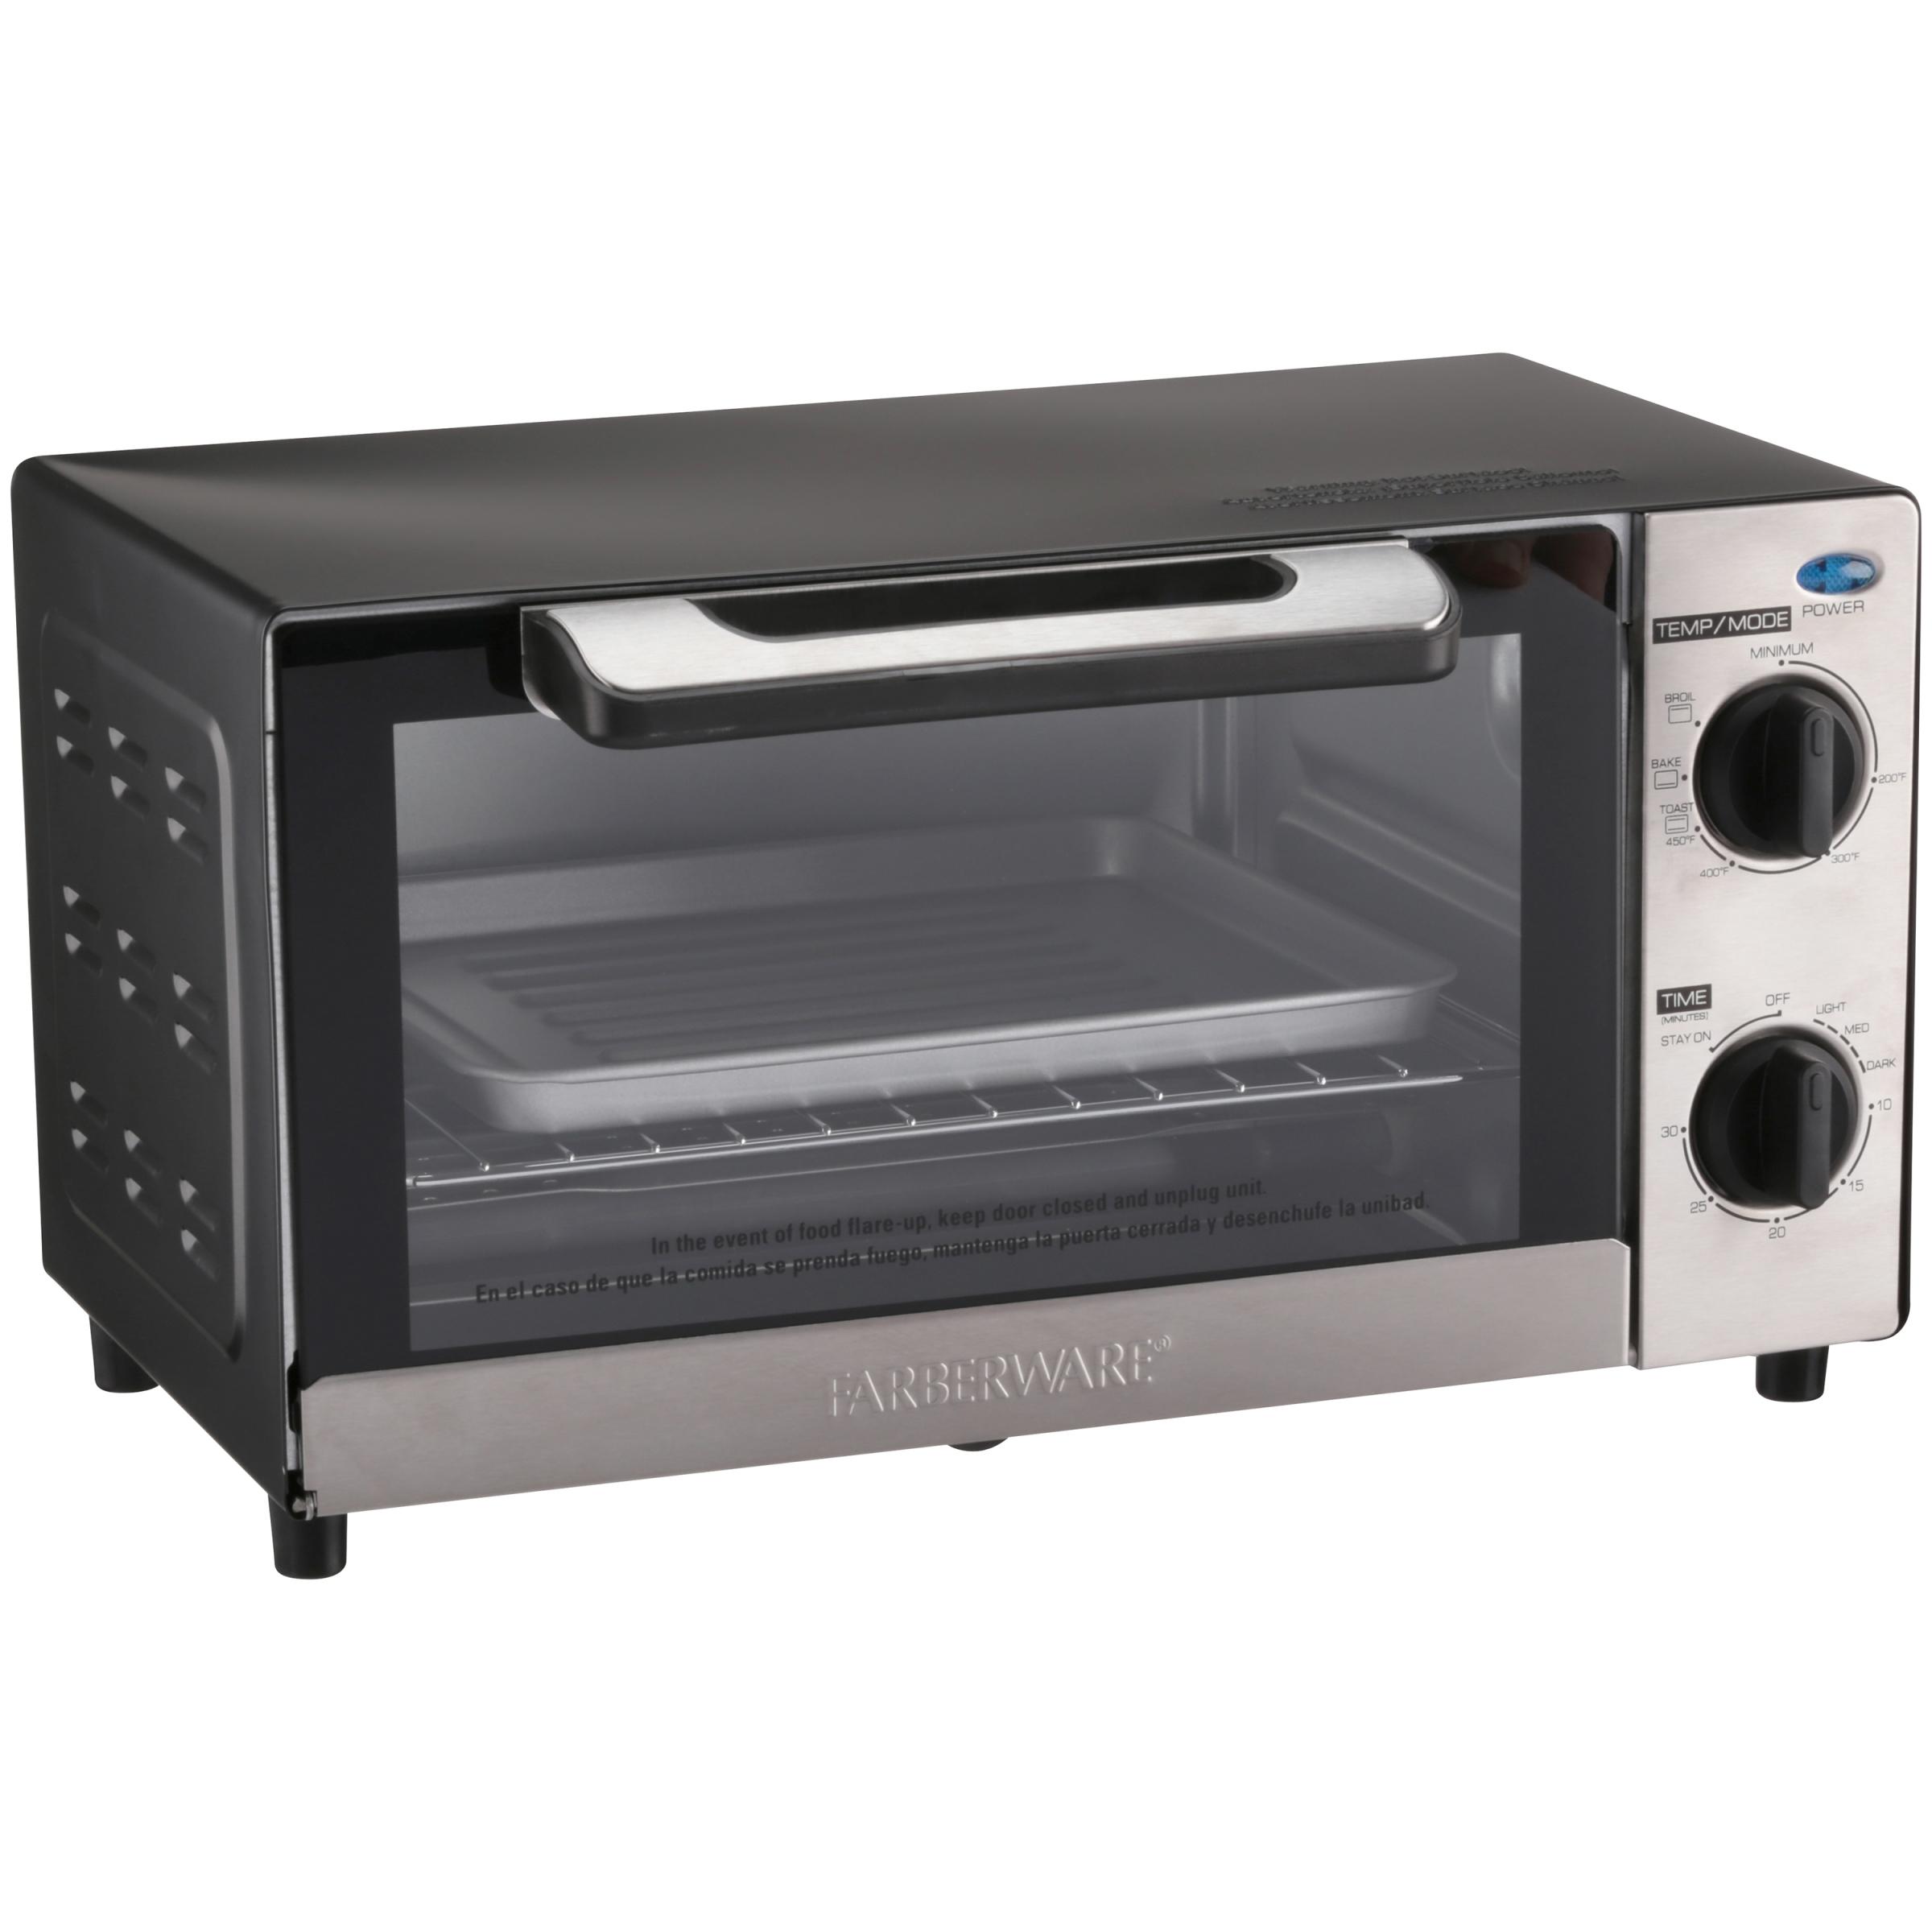 Farberware® 4-Slice Toaster Oven